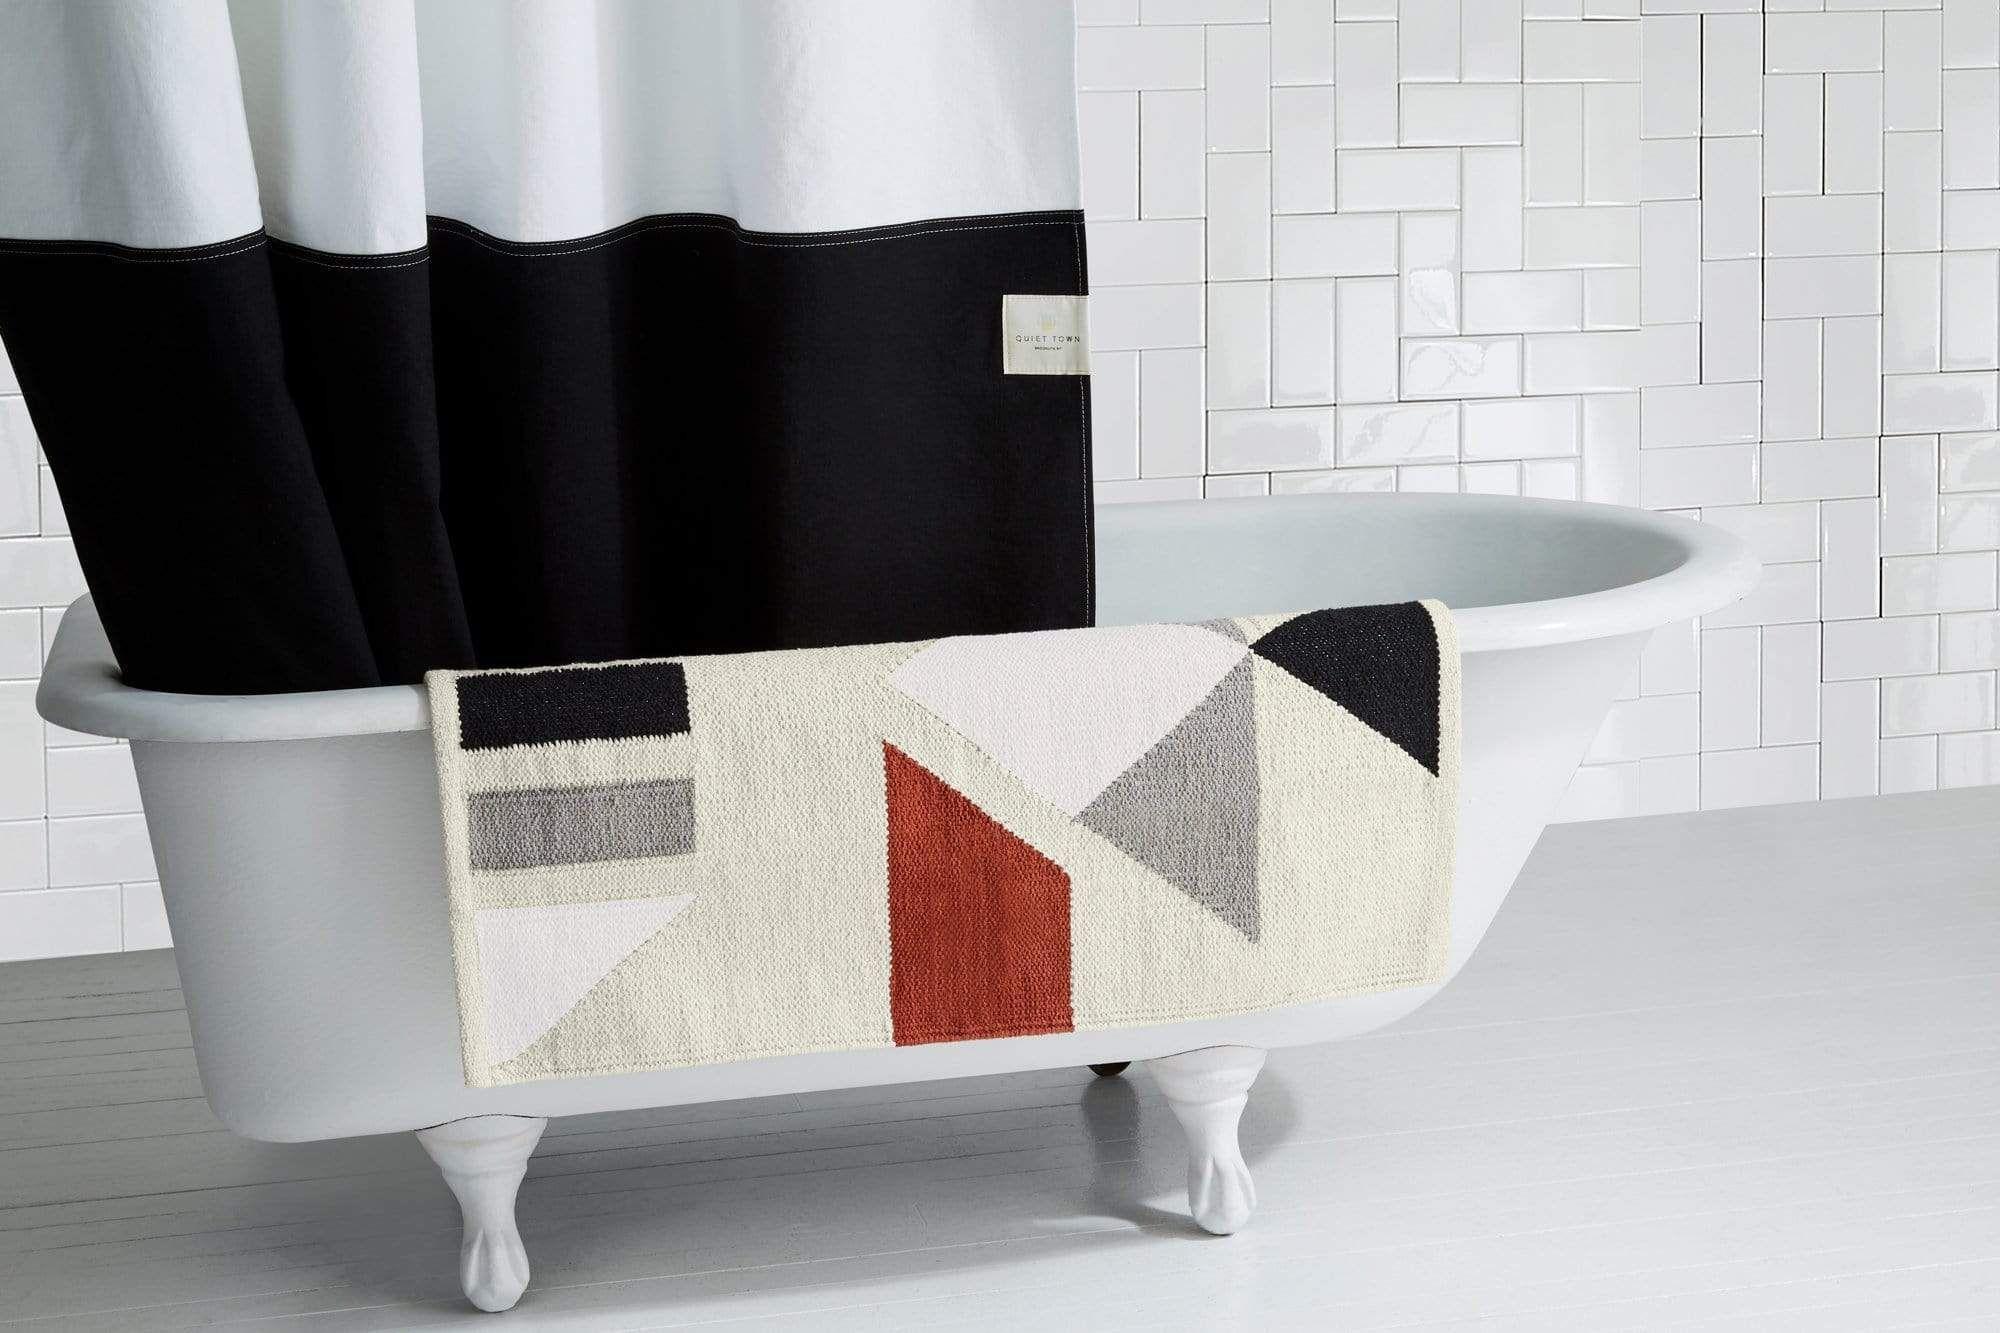 Mendocino Clay Bath Rug In 2020 Classy Rugs Bath Rug Bath Accessories Design [ 1333 x 2000 Pixel ]